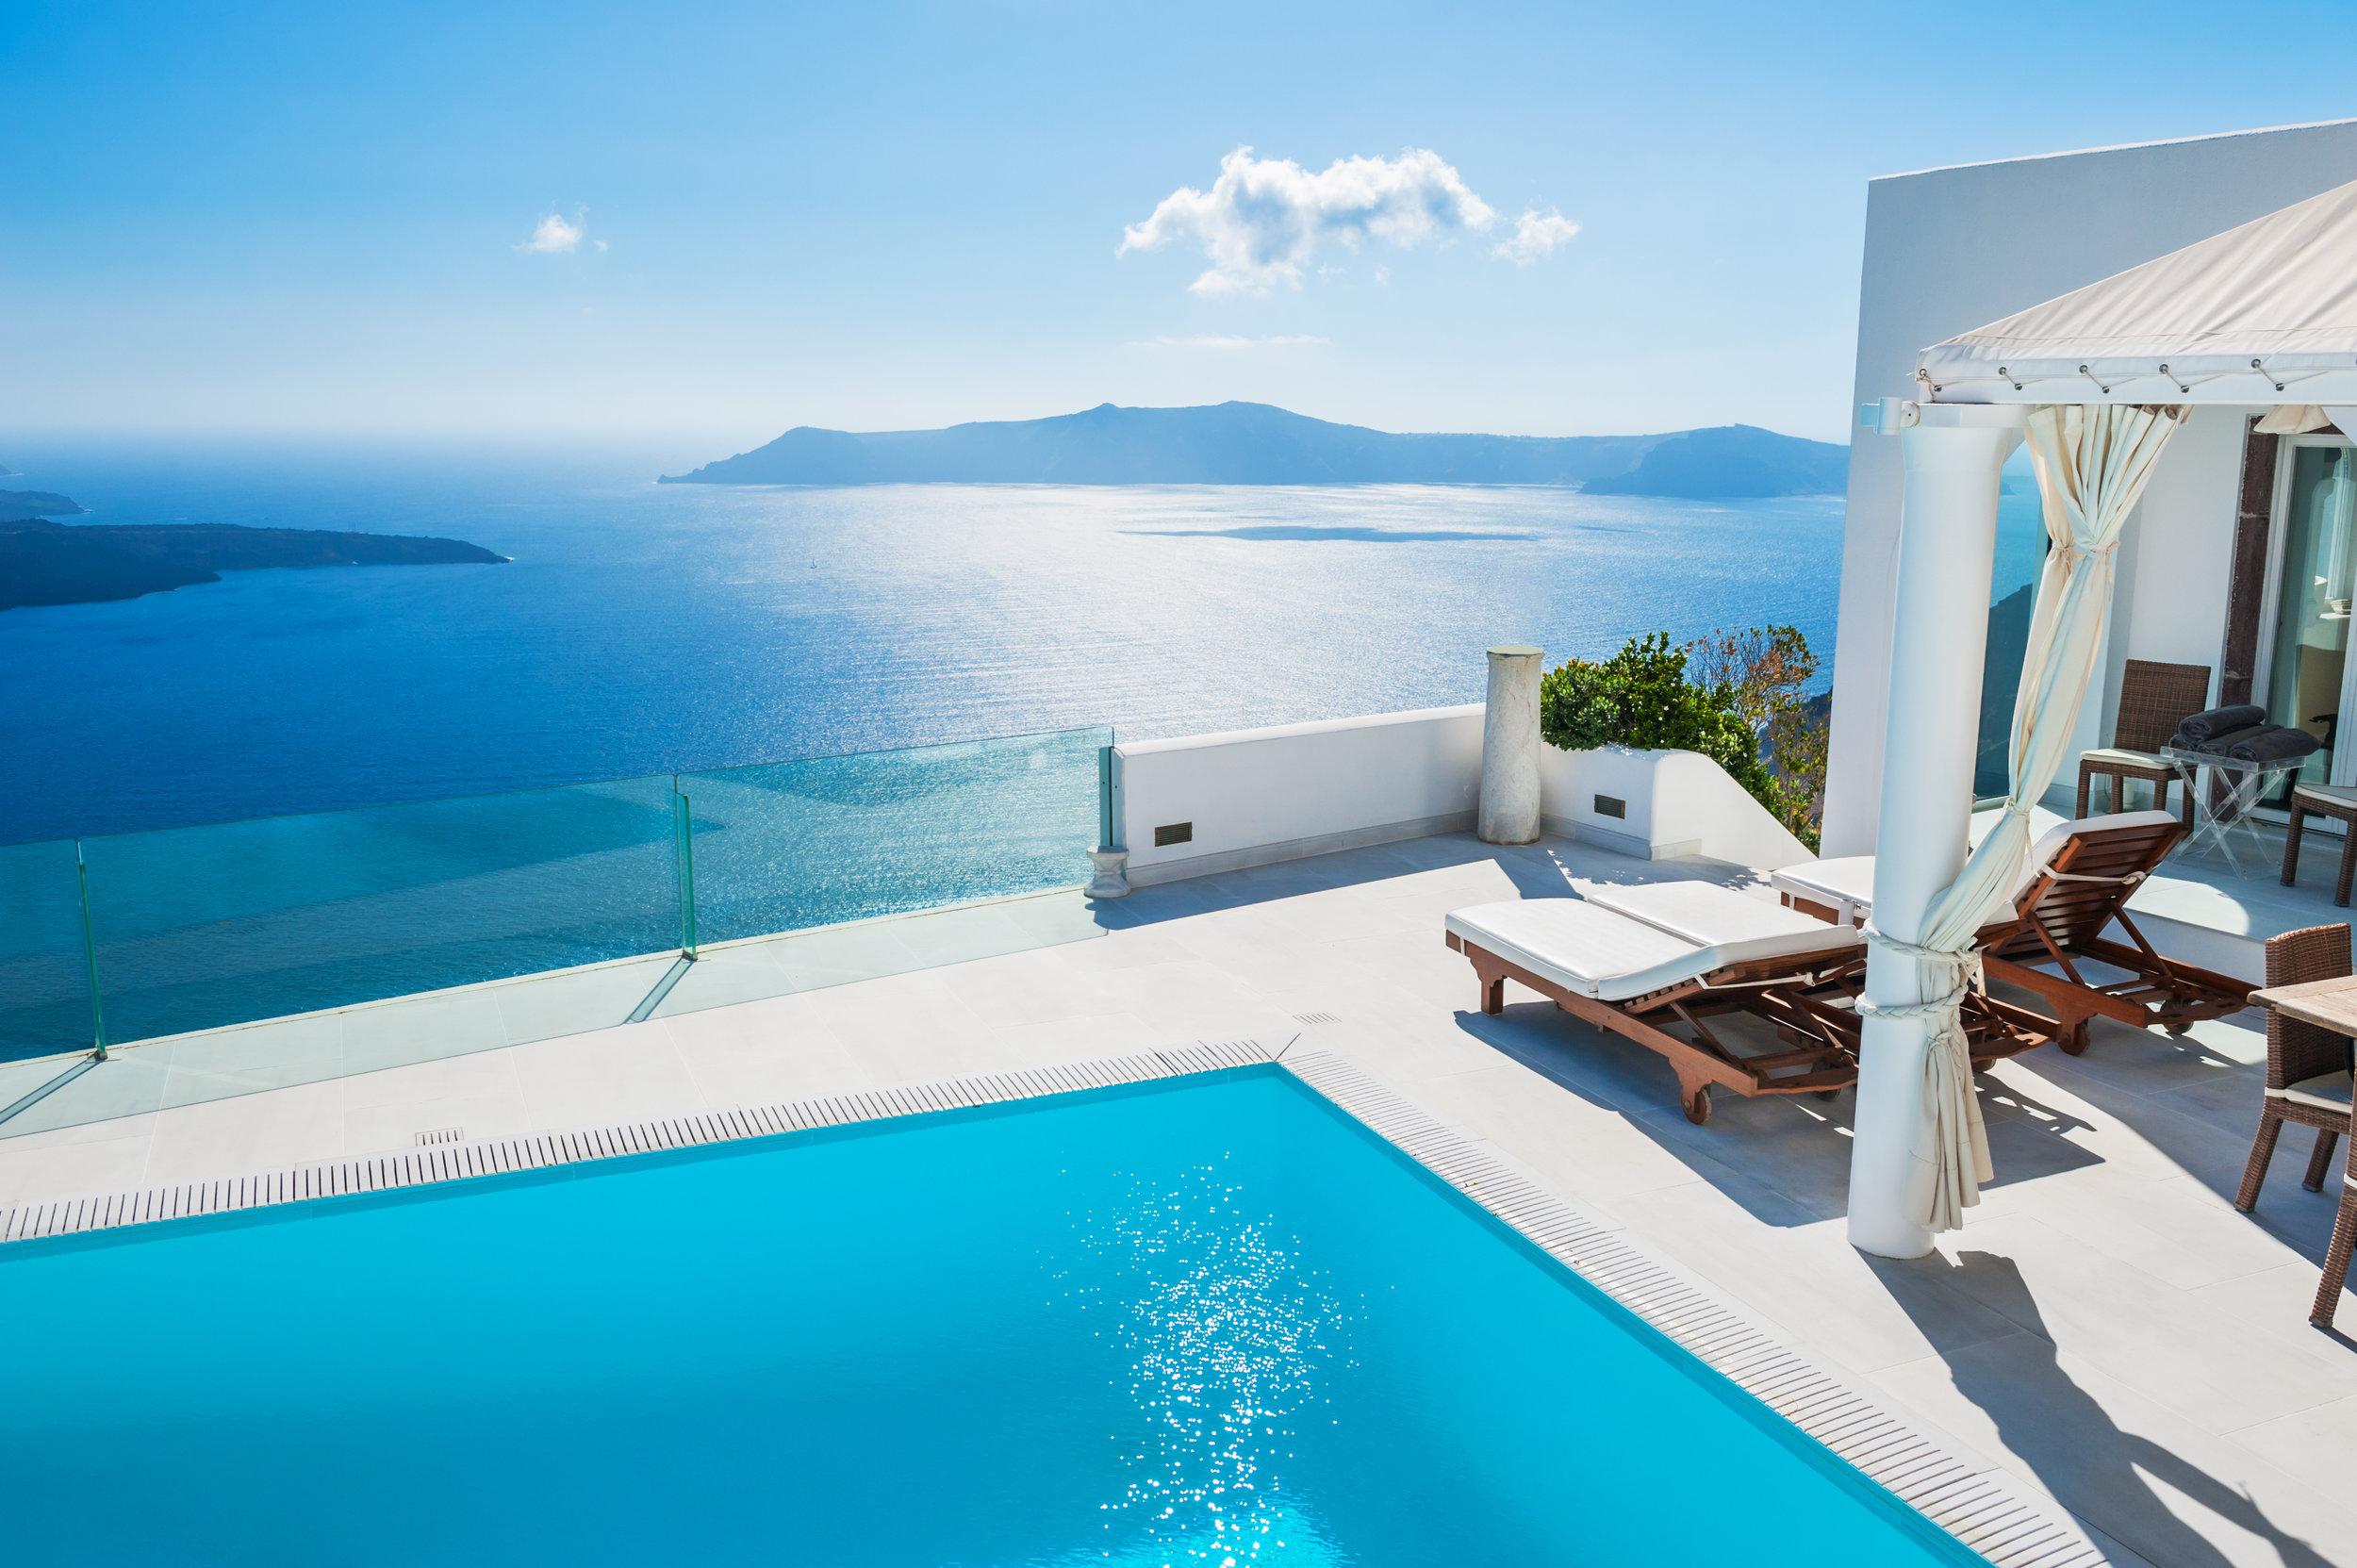 White-architecture-on-Santorini-island,-Greece.-476988858_4205x2798 (1).jpeg